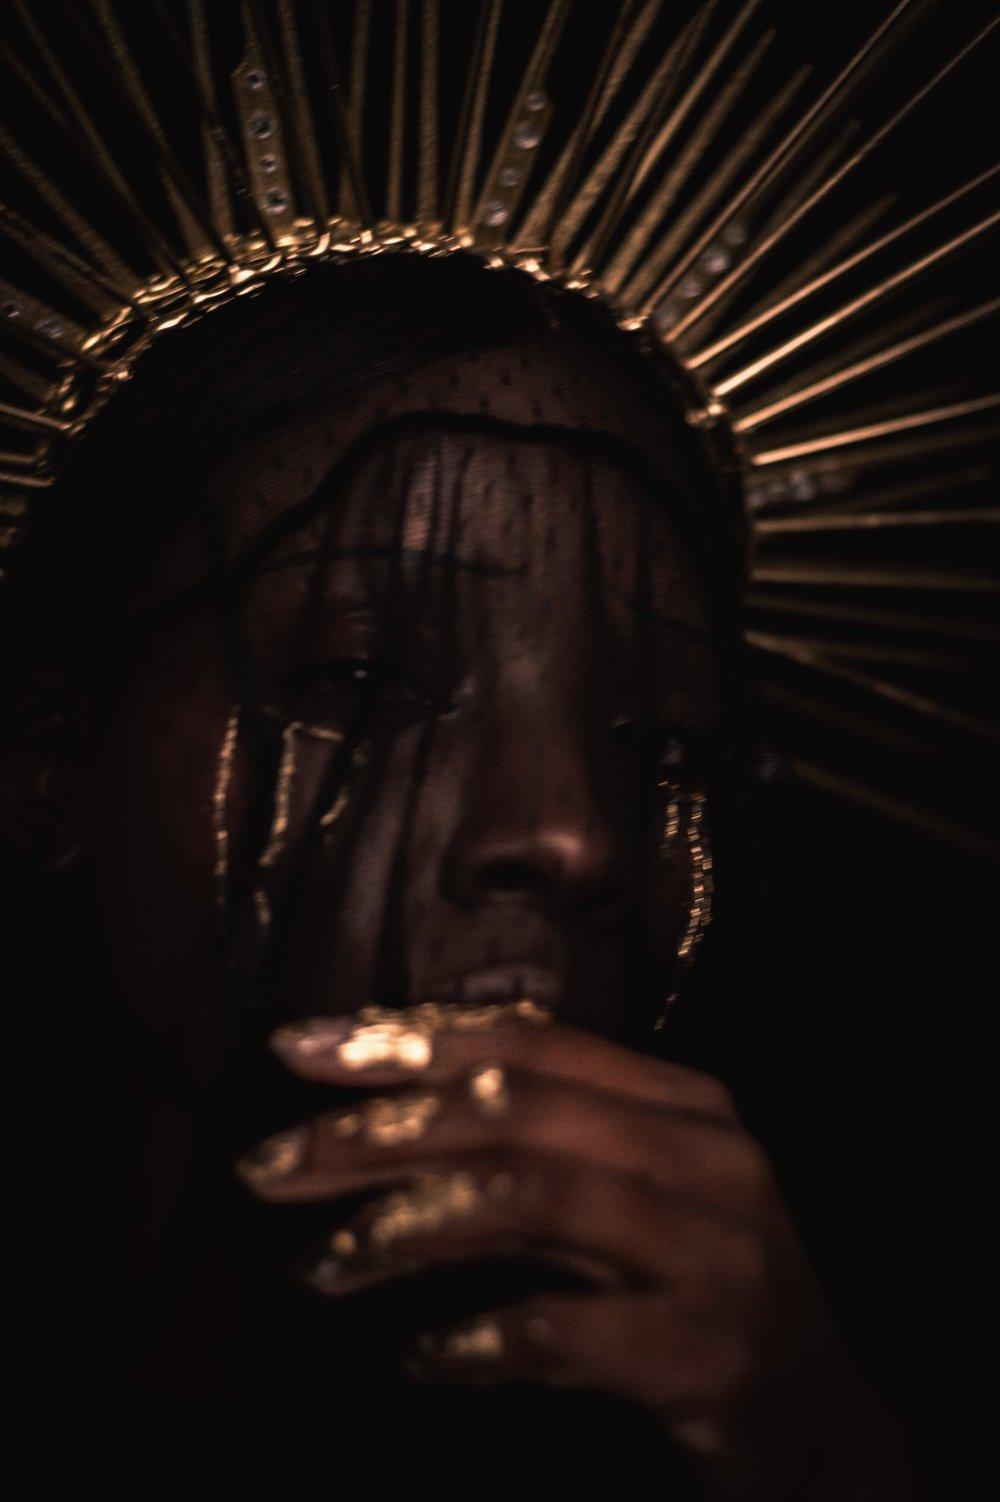 TheGlossier-TashaJames-Halloween-2018-Crying-Saint-Gold-Heavenly-Bodies17.JPG